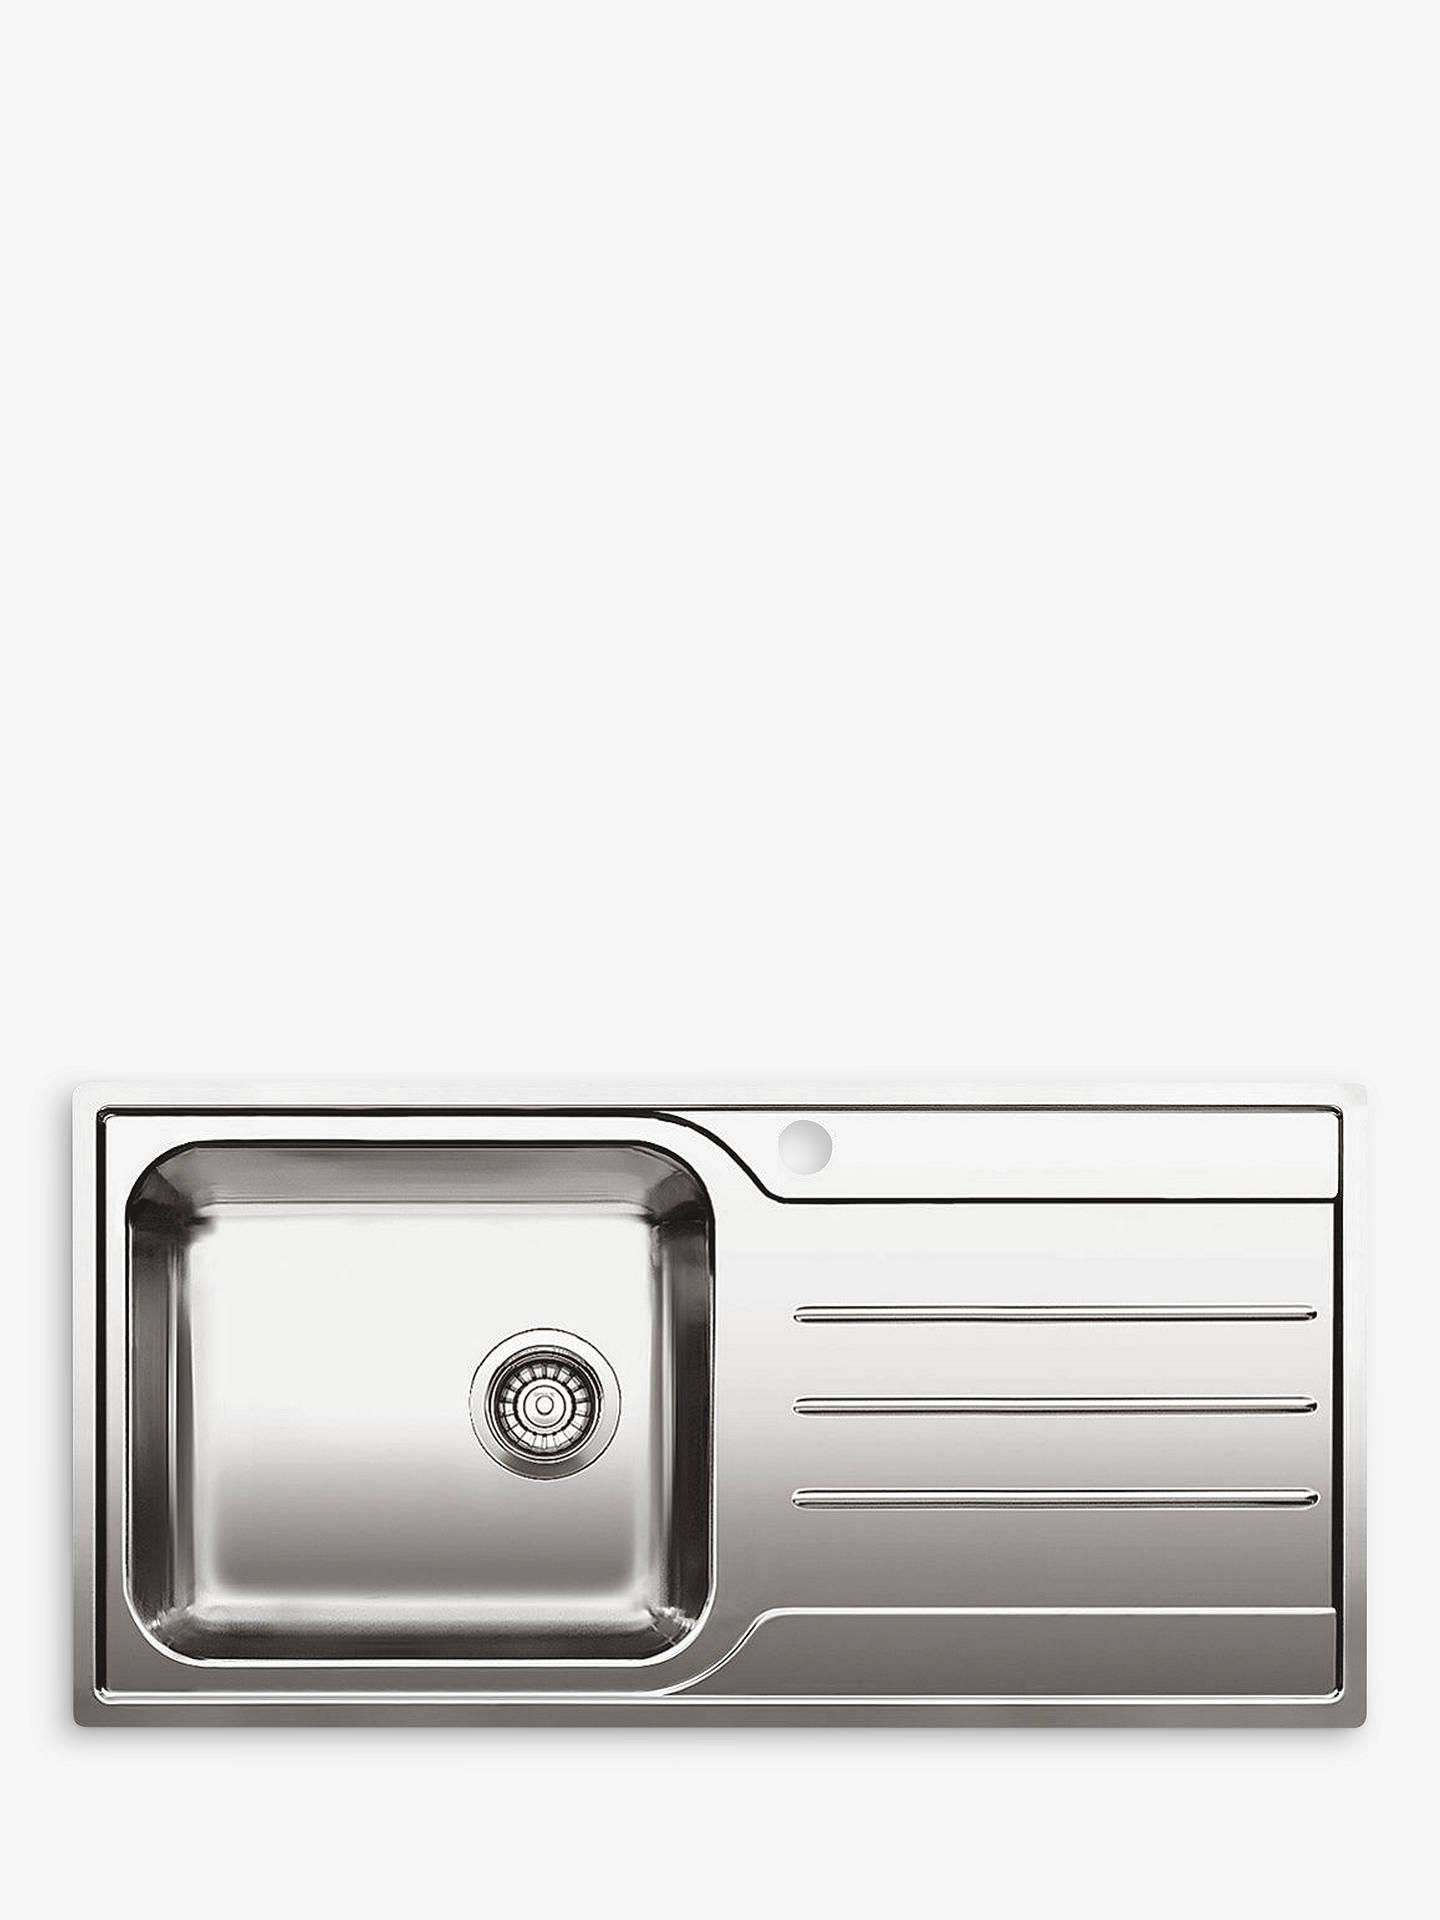 Blanco Median XL 6 S-IF Single Bowl Inset Kitchen Sink